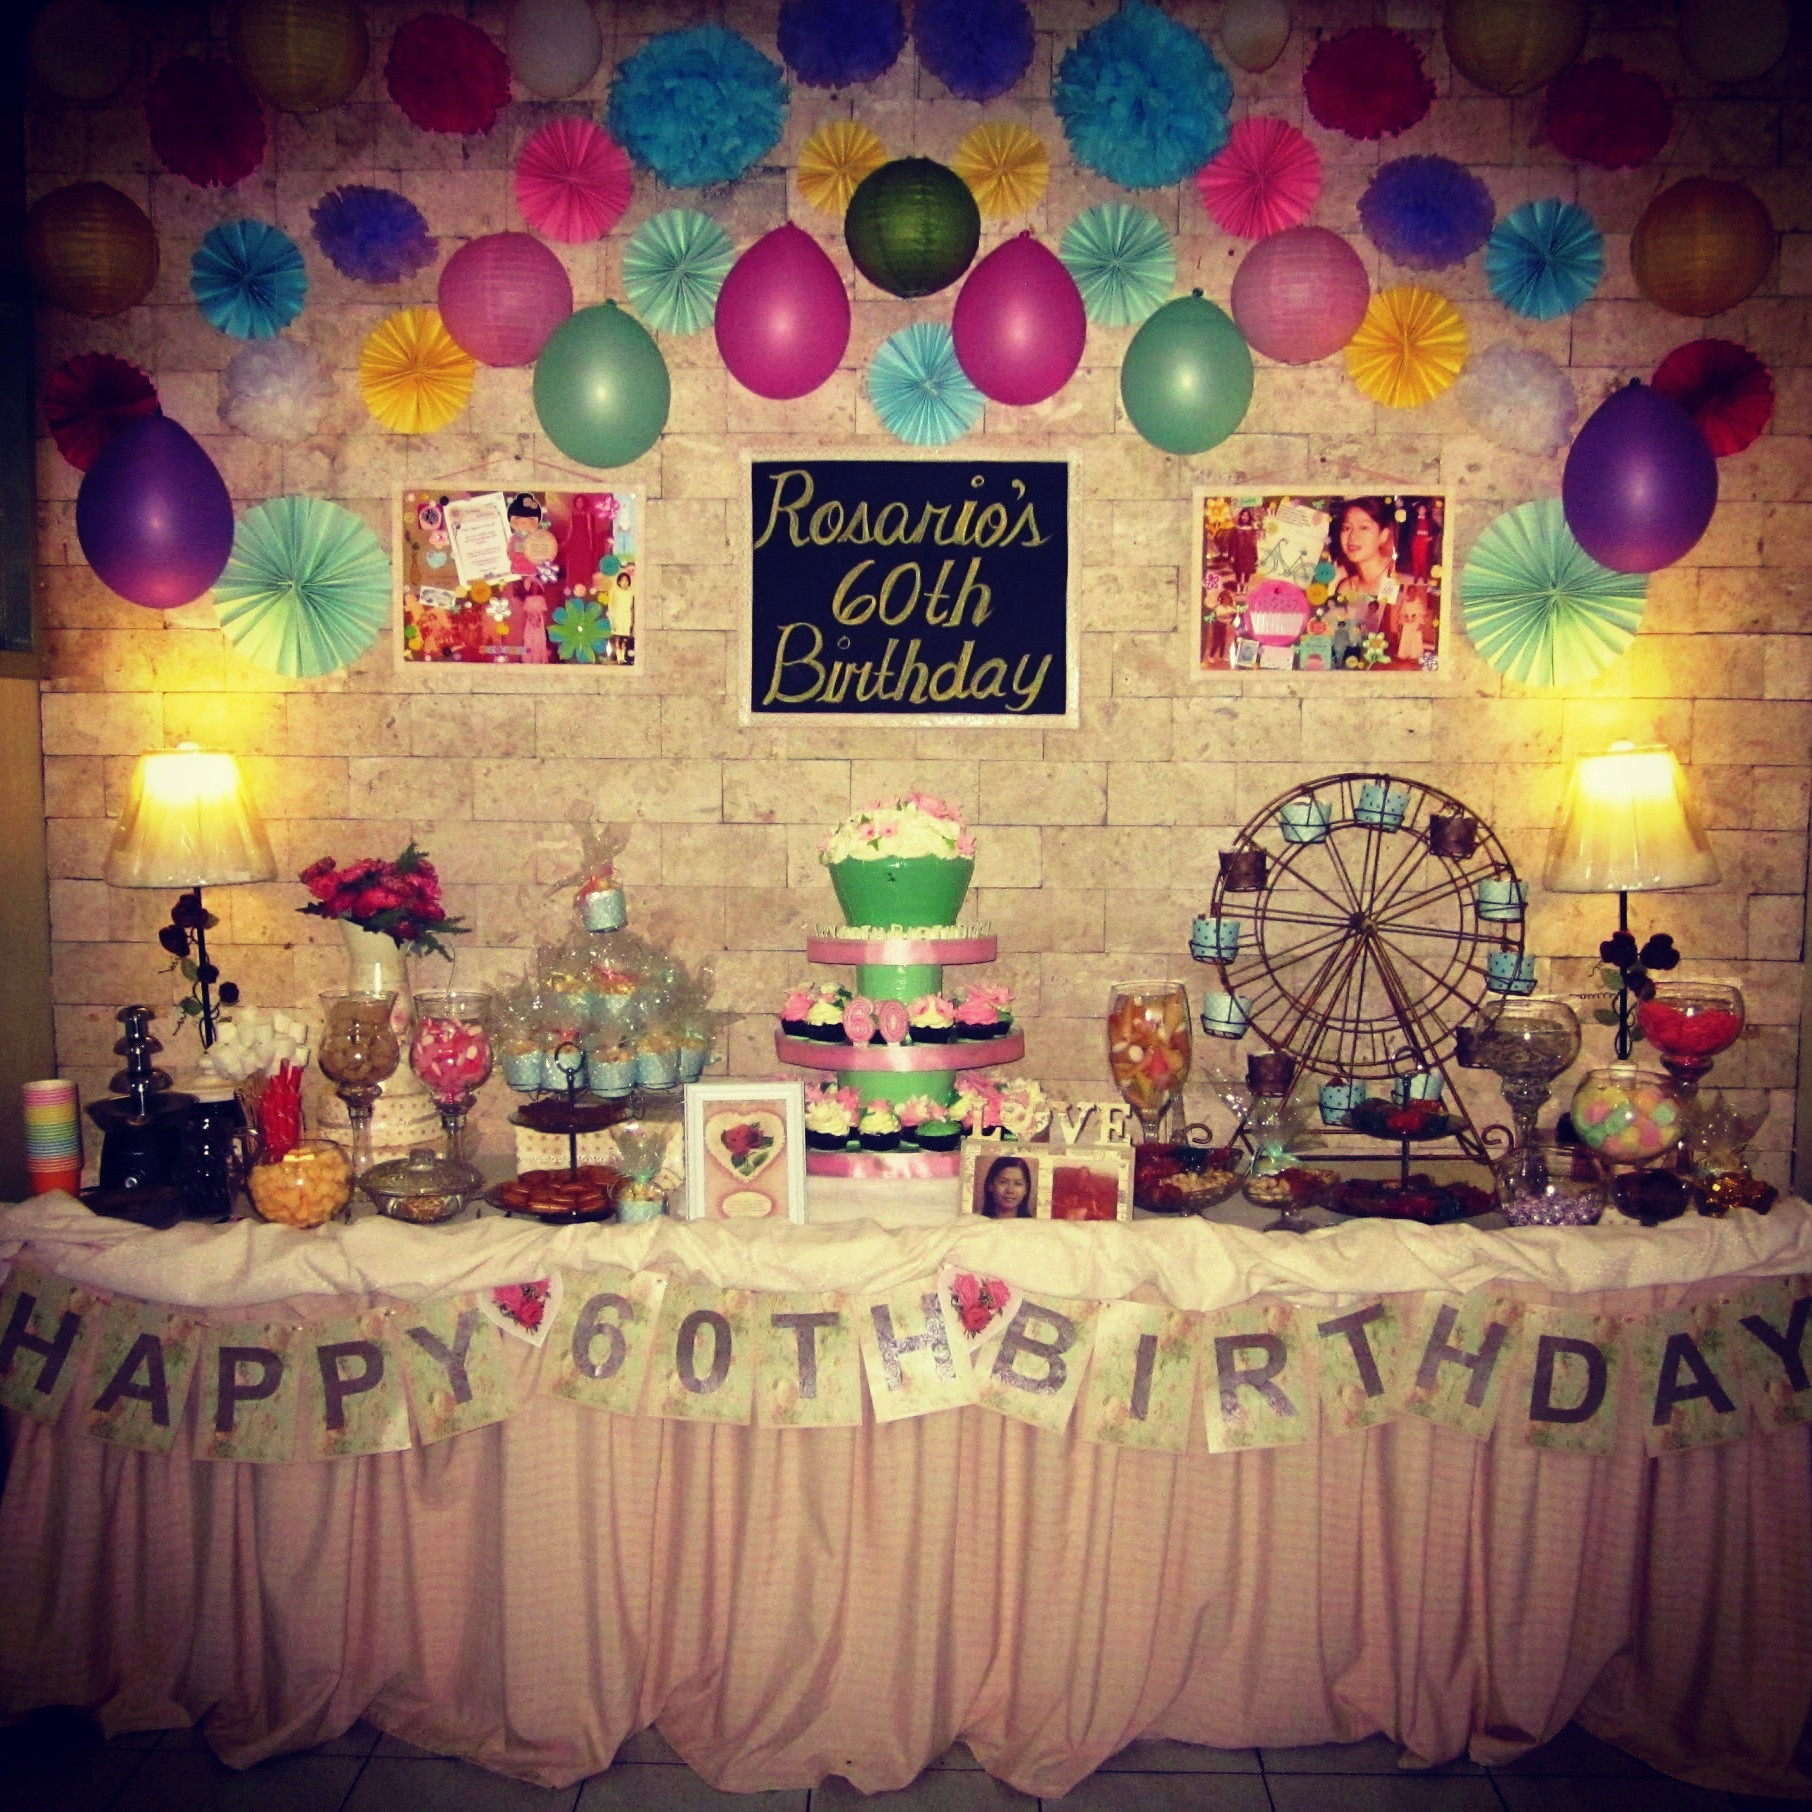 60th Birthday Decorations For Mom  60th birthday party ideas for mom plus mum 60th birthday